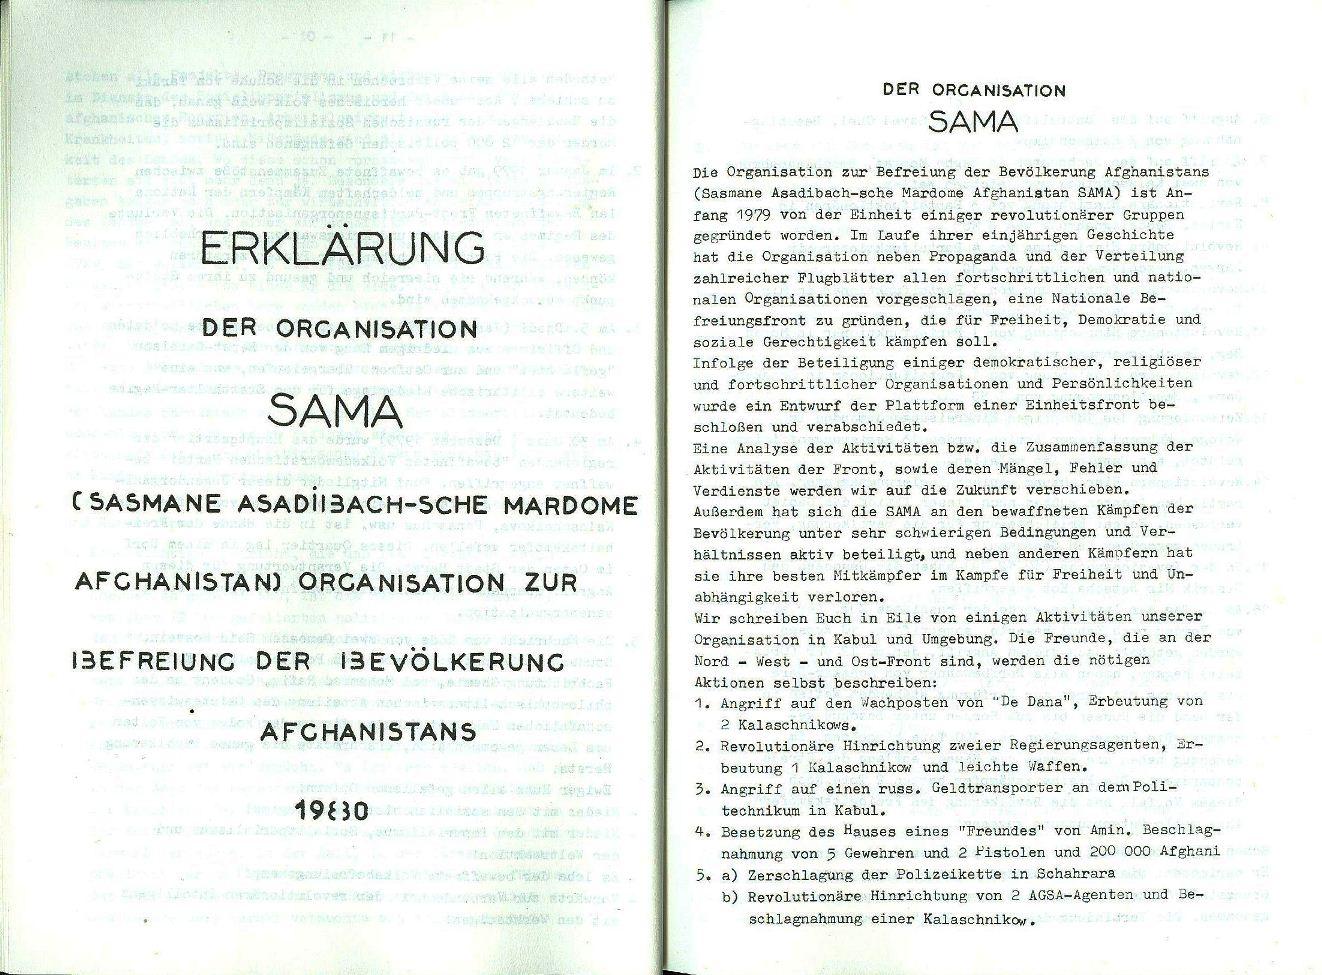 Afghanistan030